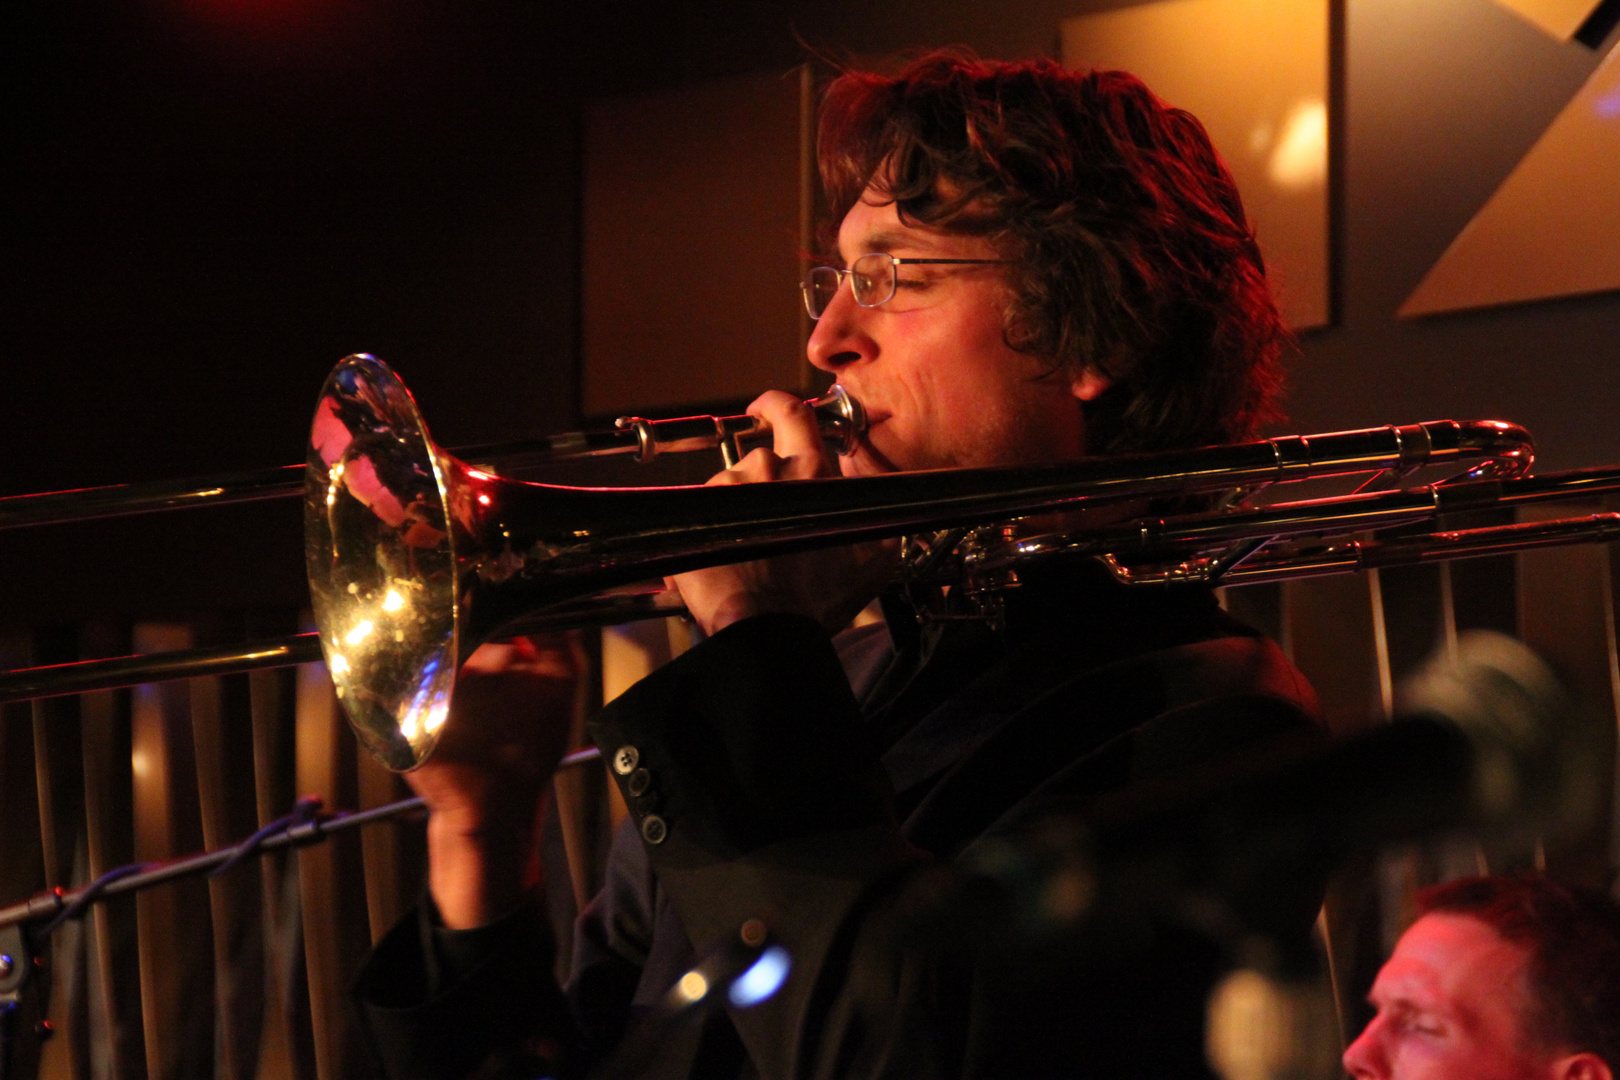 Stuttgart Jazzpodium - Johannes Lauer